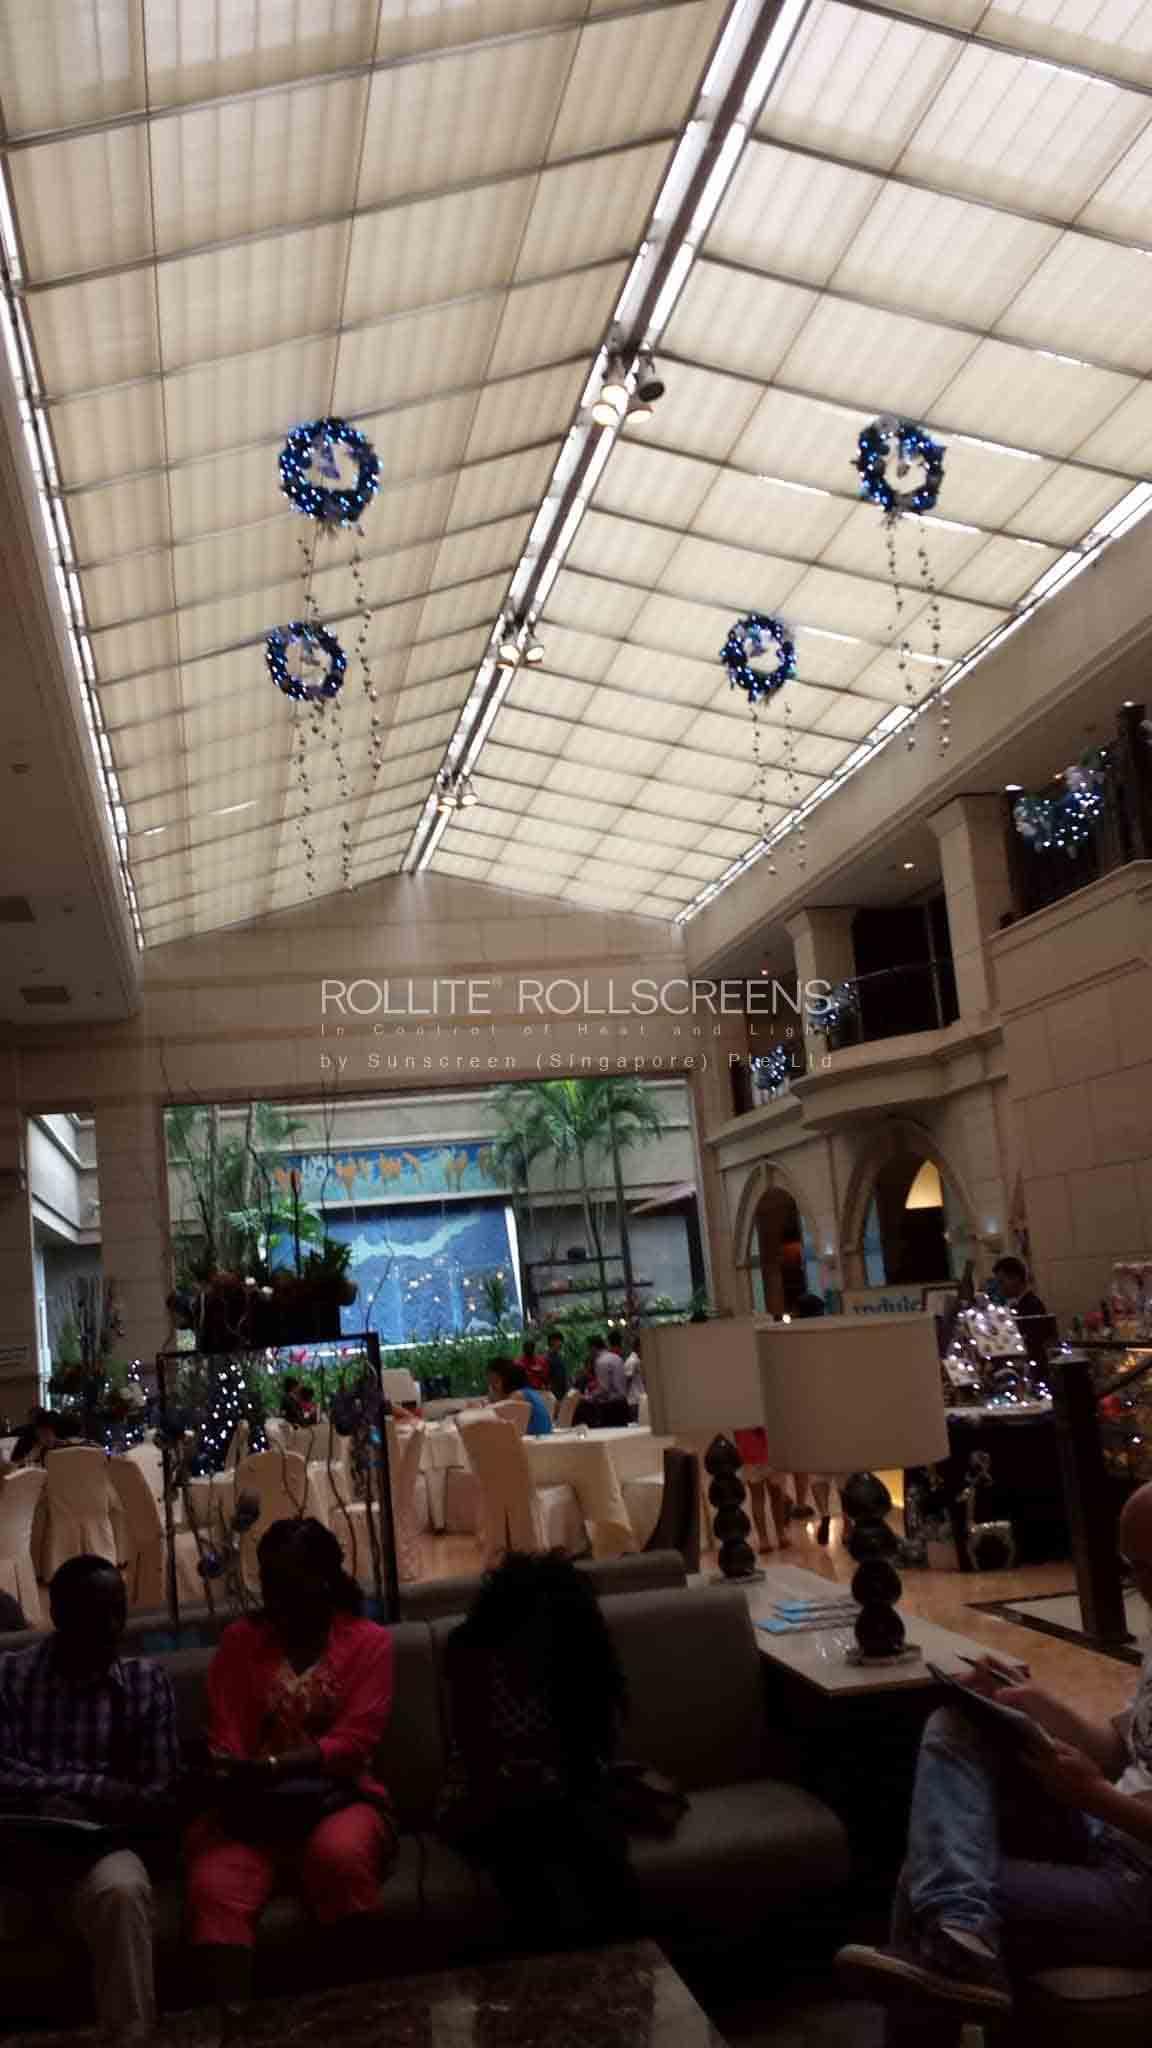 Sunscreen-Singapore_Rollite-Skylight-3